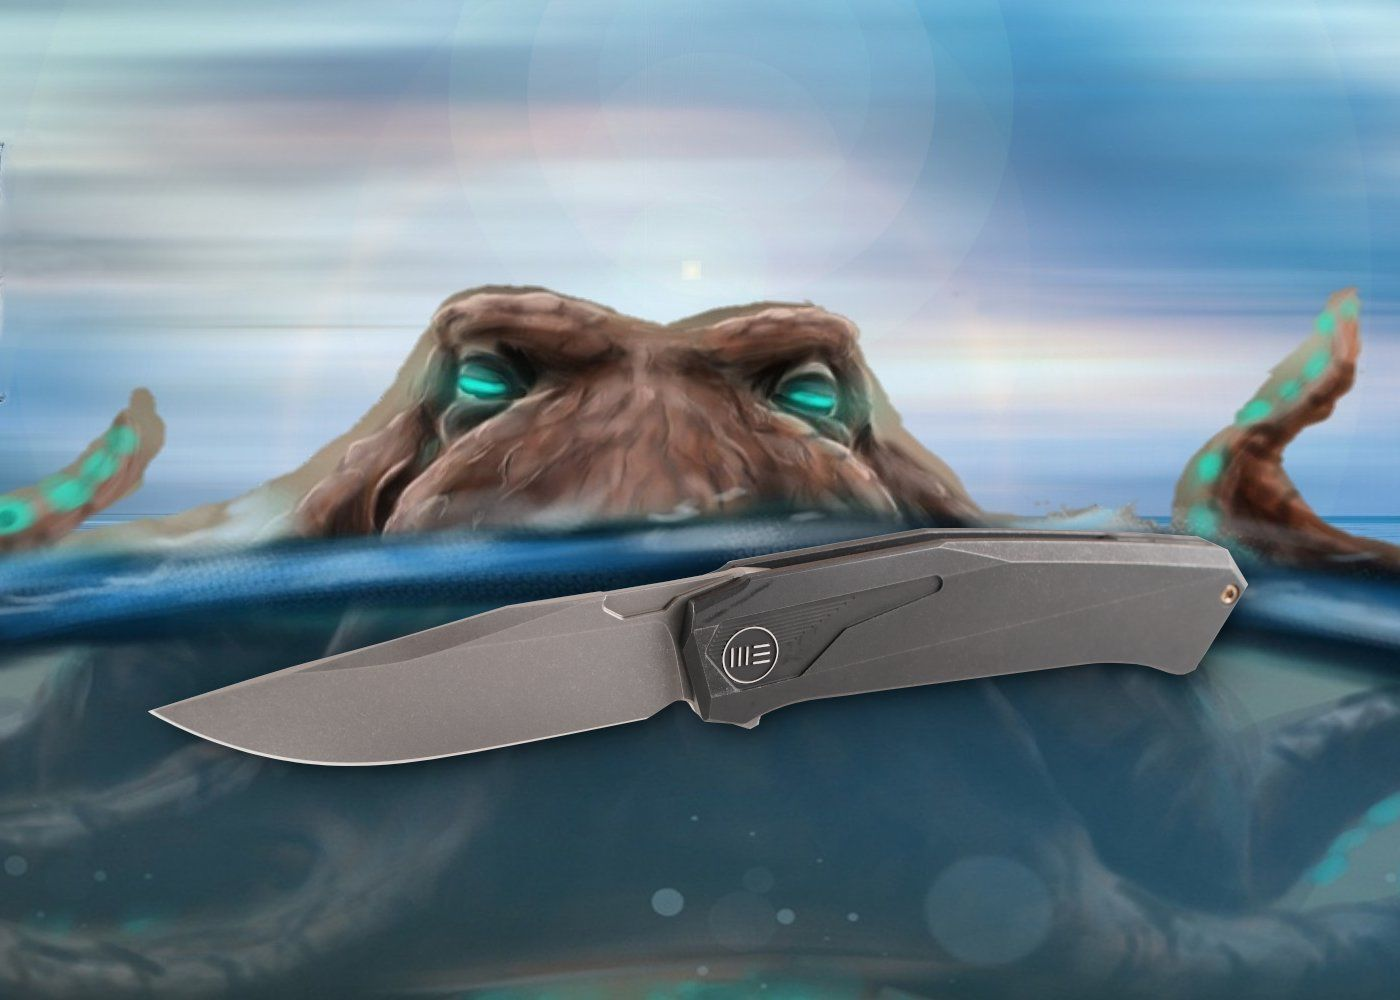 WE Knife Gava - Kooperation mit Rafal Brzeski